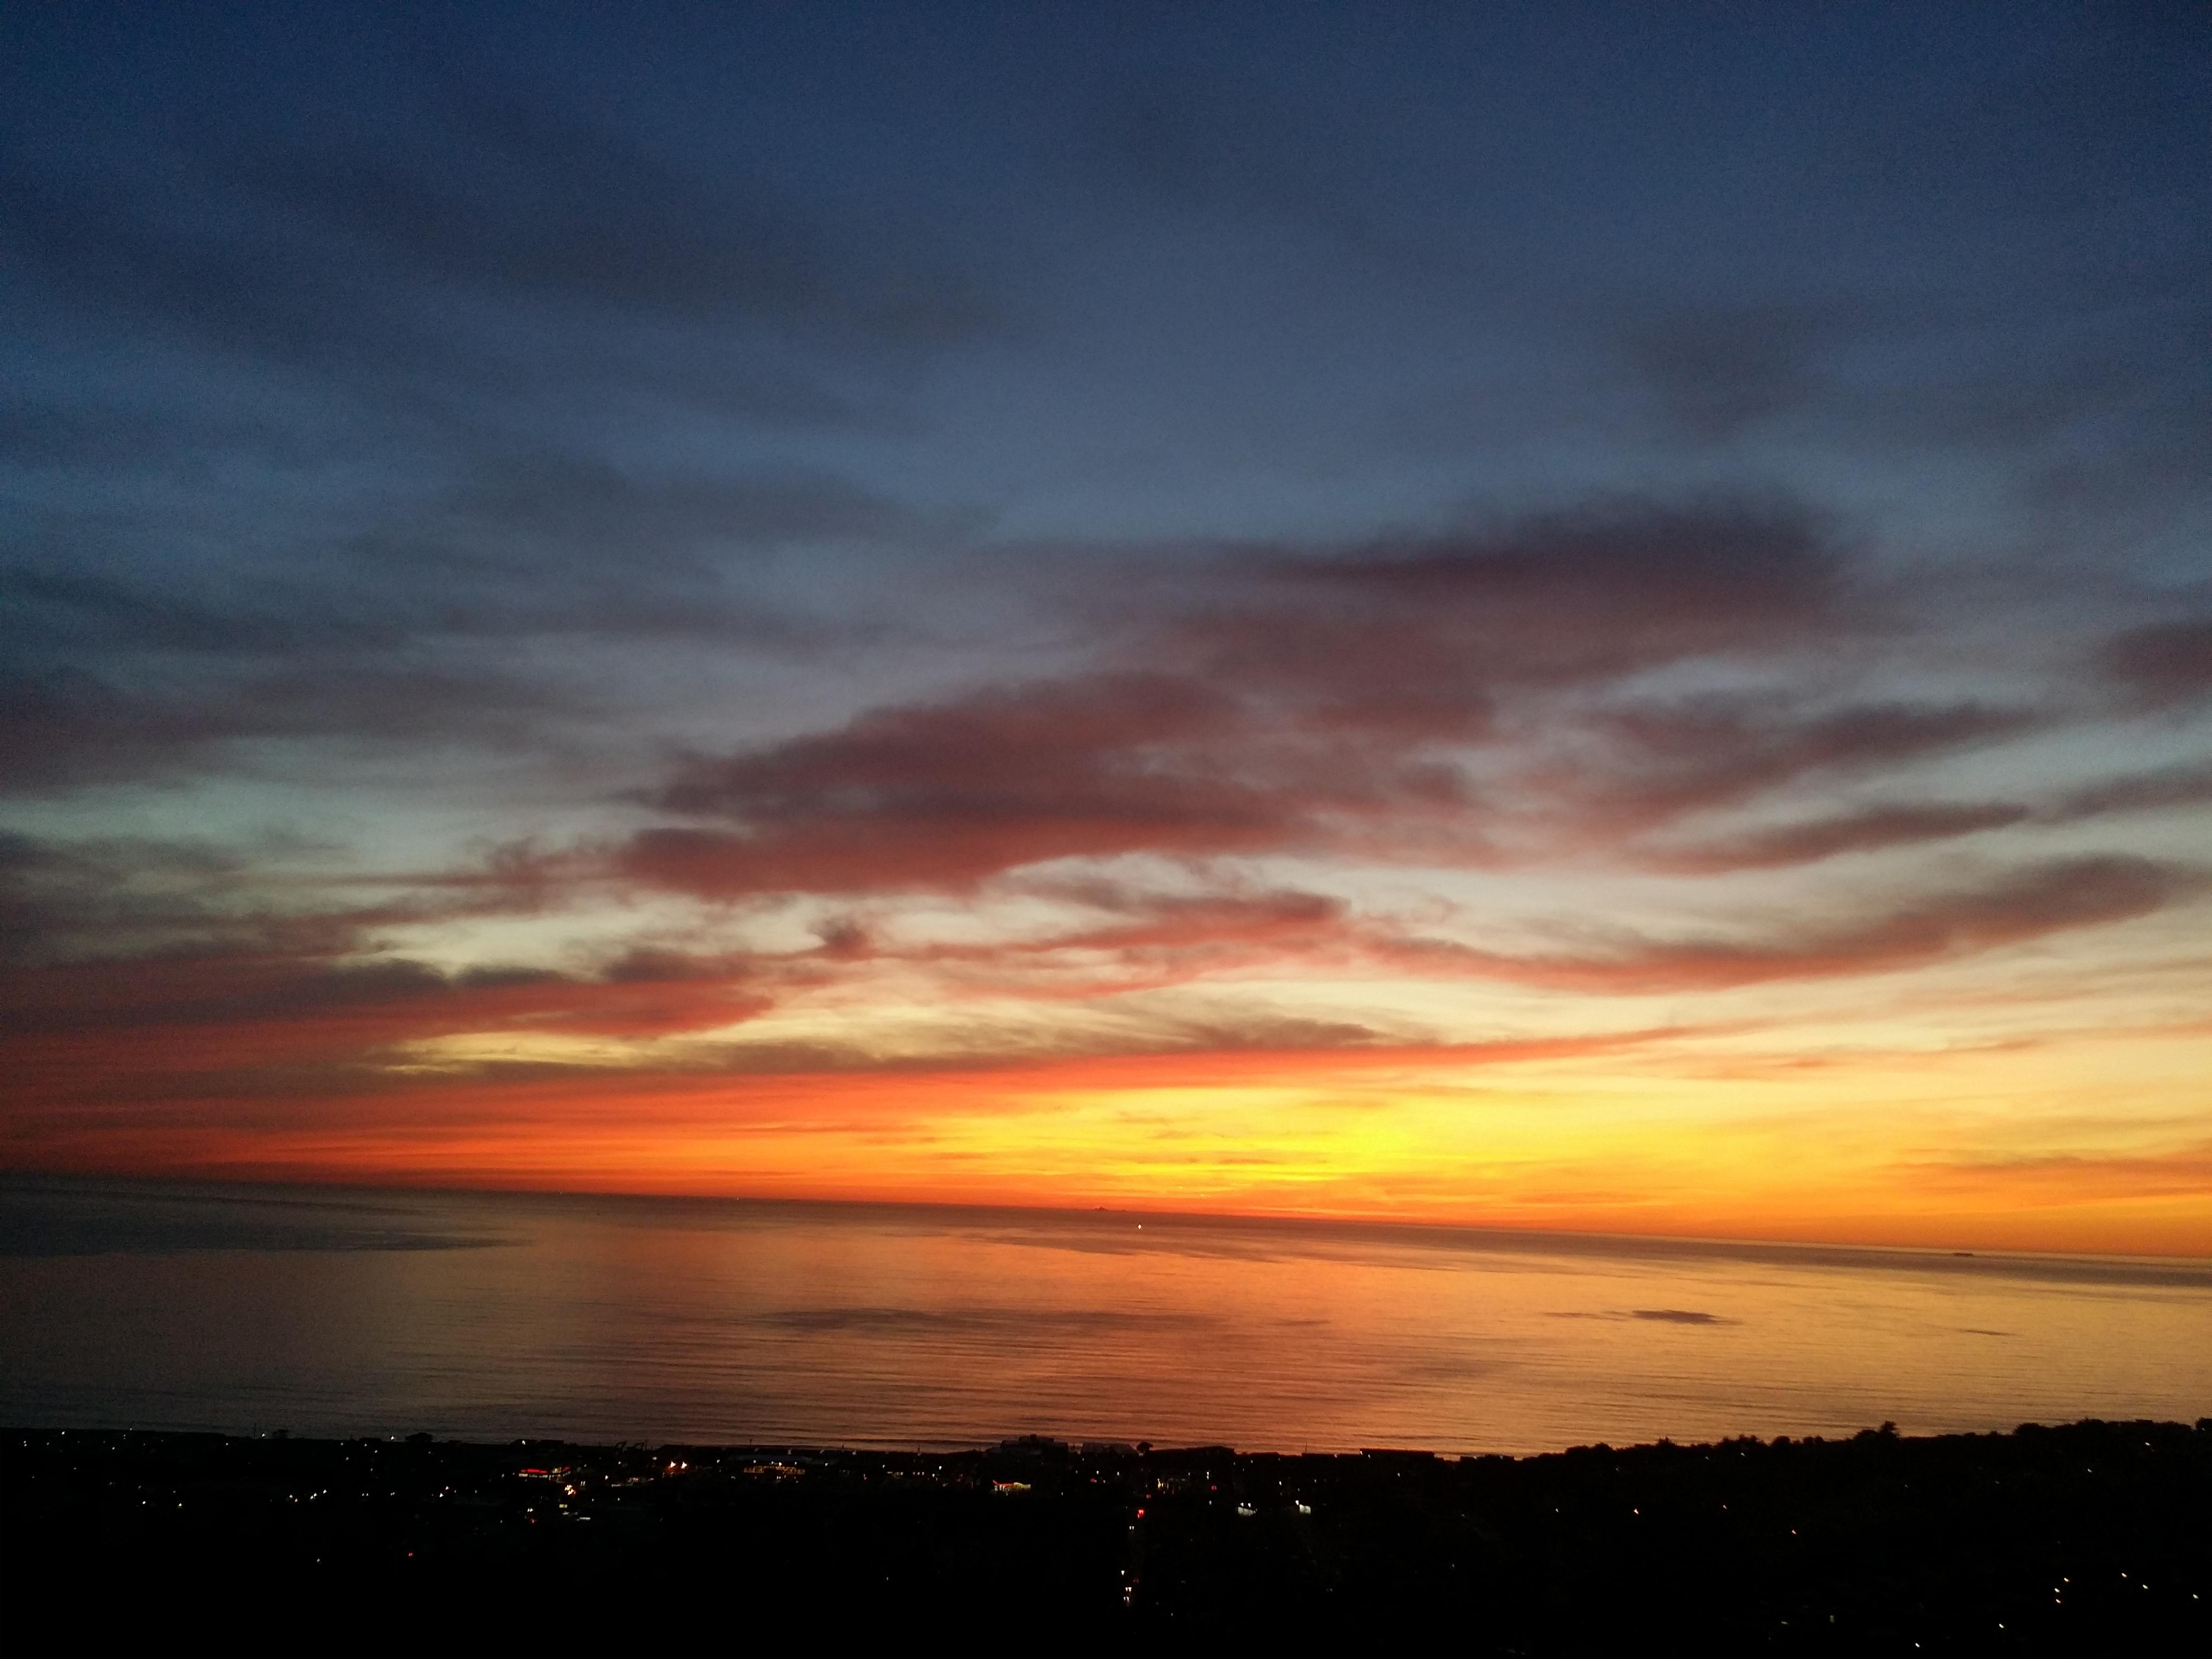 Pacifica, CA Sunset from Westview Neighborhood